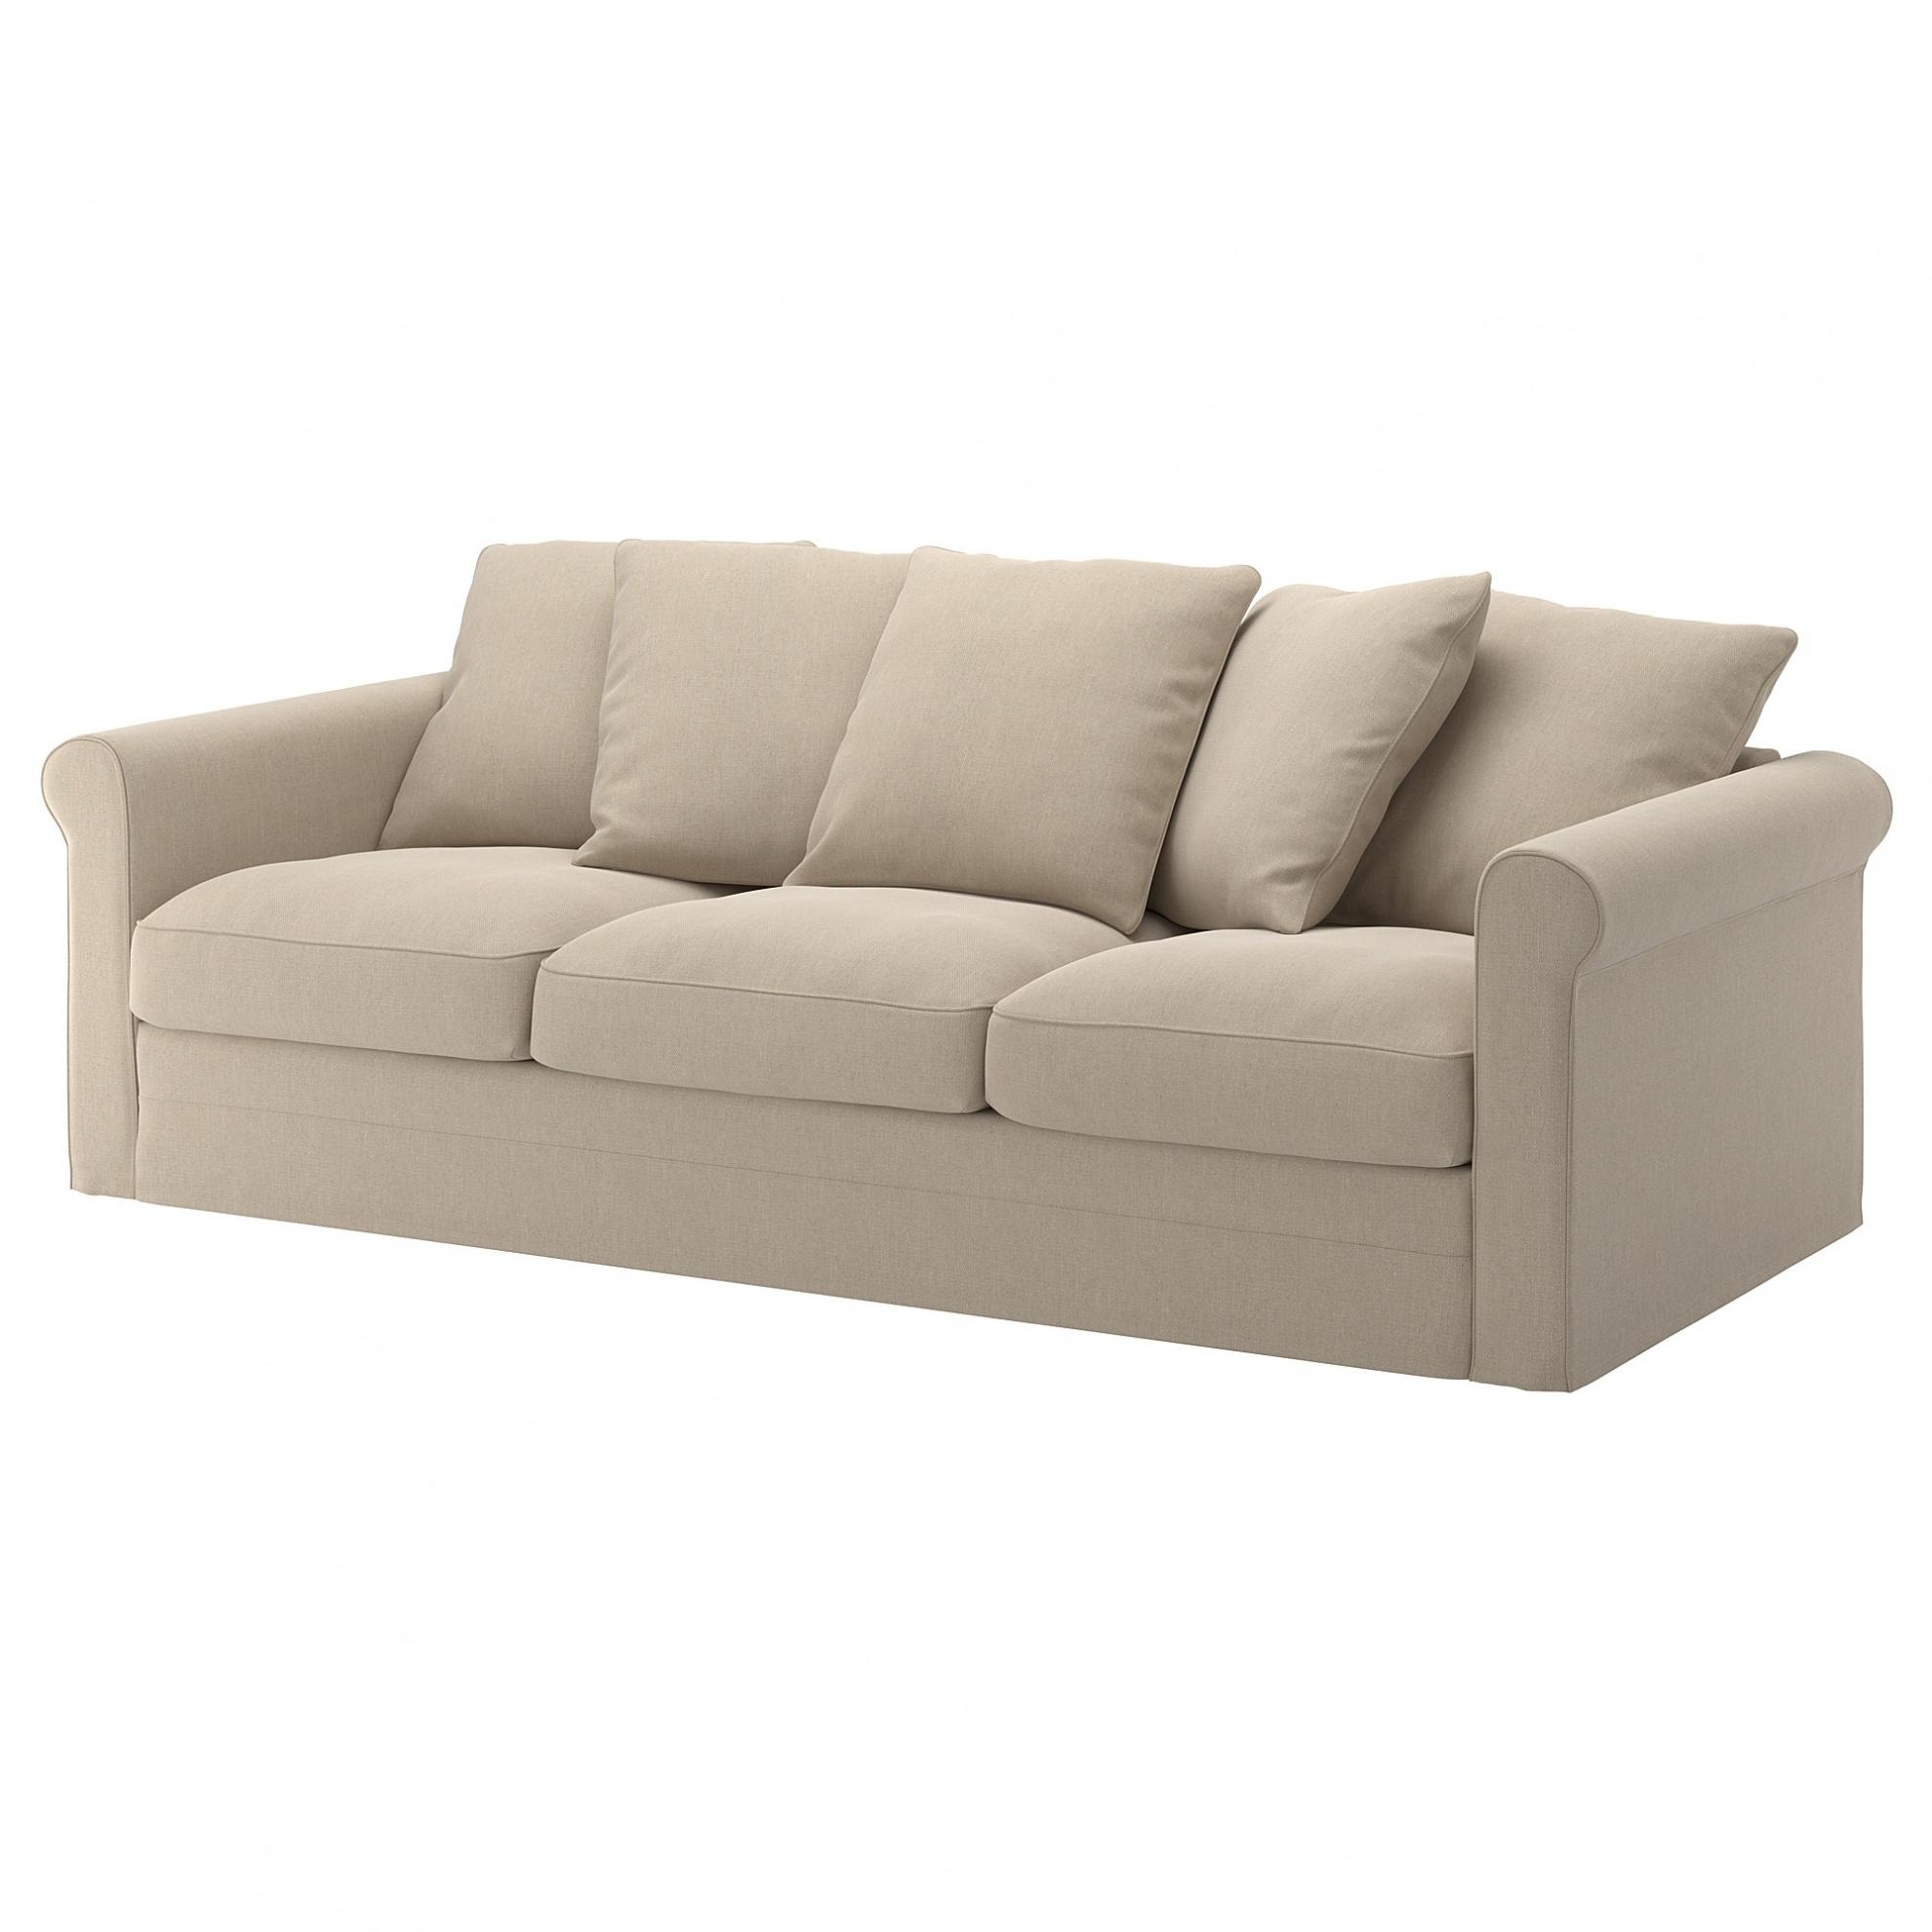 Canapé Convertible Angle Ikea Frais Stock Maha S Canapé Tissu 3 Places Home Mahagranda